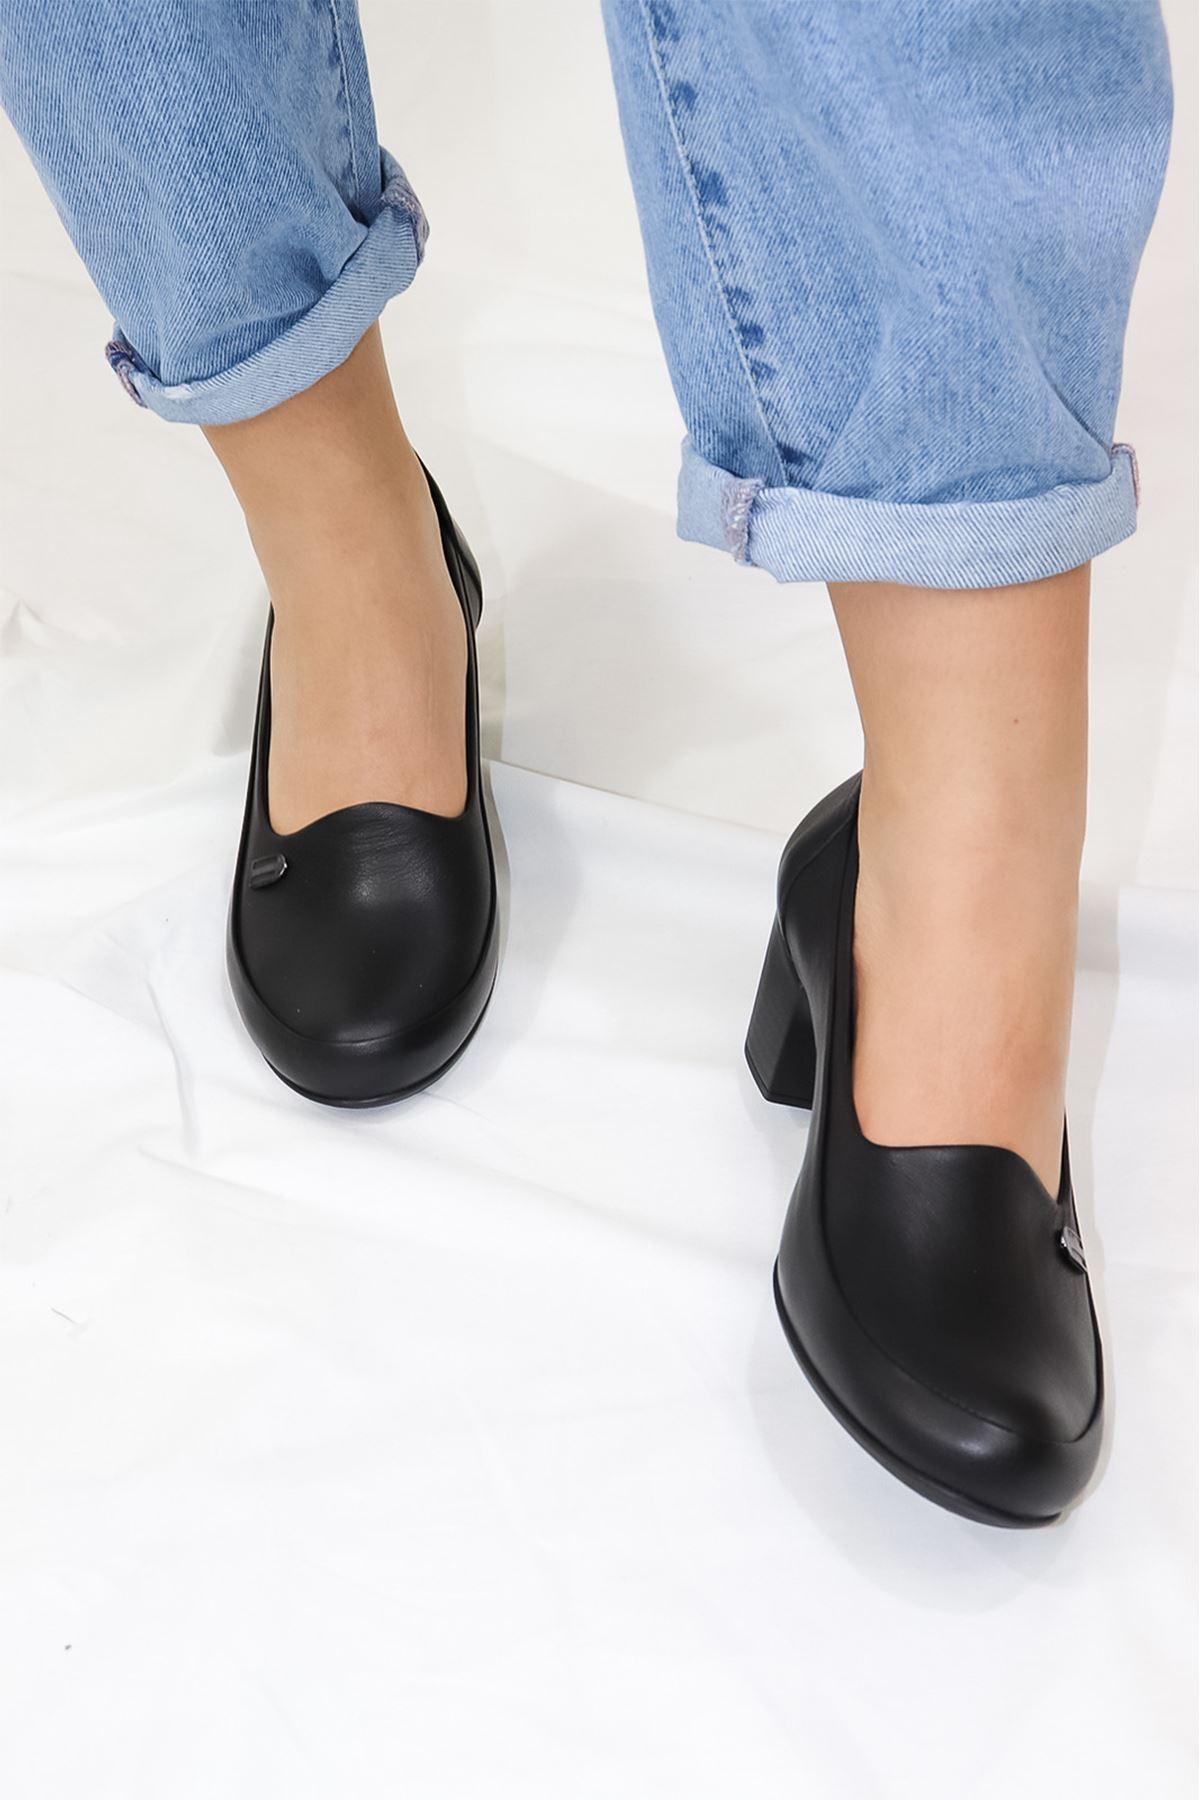 Mammamia - D21YA - 3360-B Siyah Topuklu Kadın Ayakkabısı